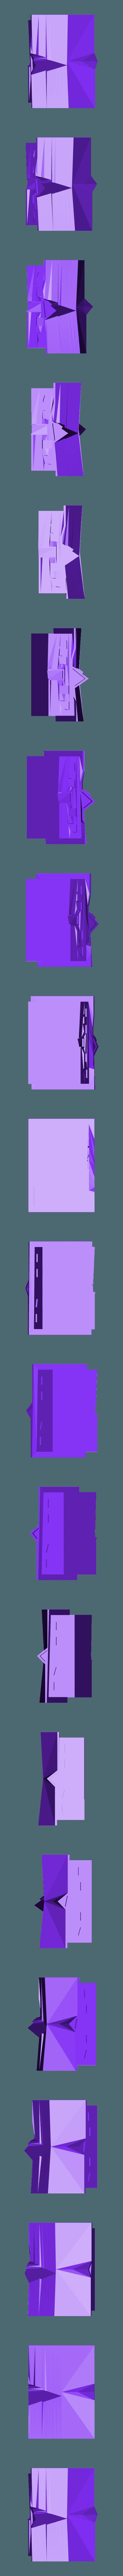 Prairie_House.stl Download free STL file Abandoned House (N-Scale) • Model to 3D print, MFouillard